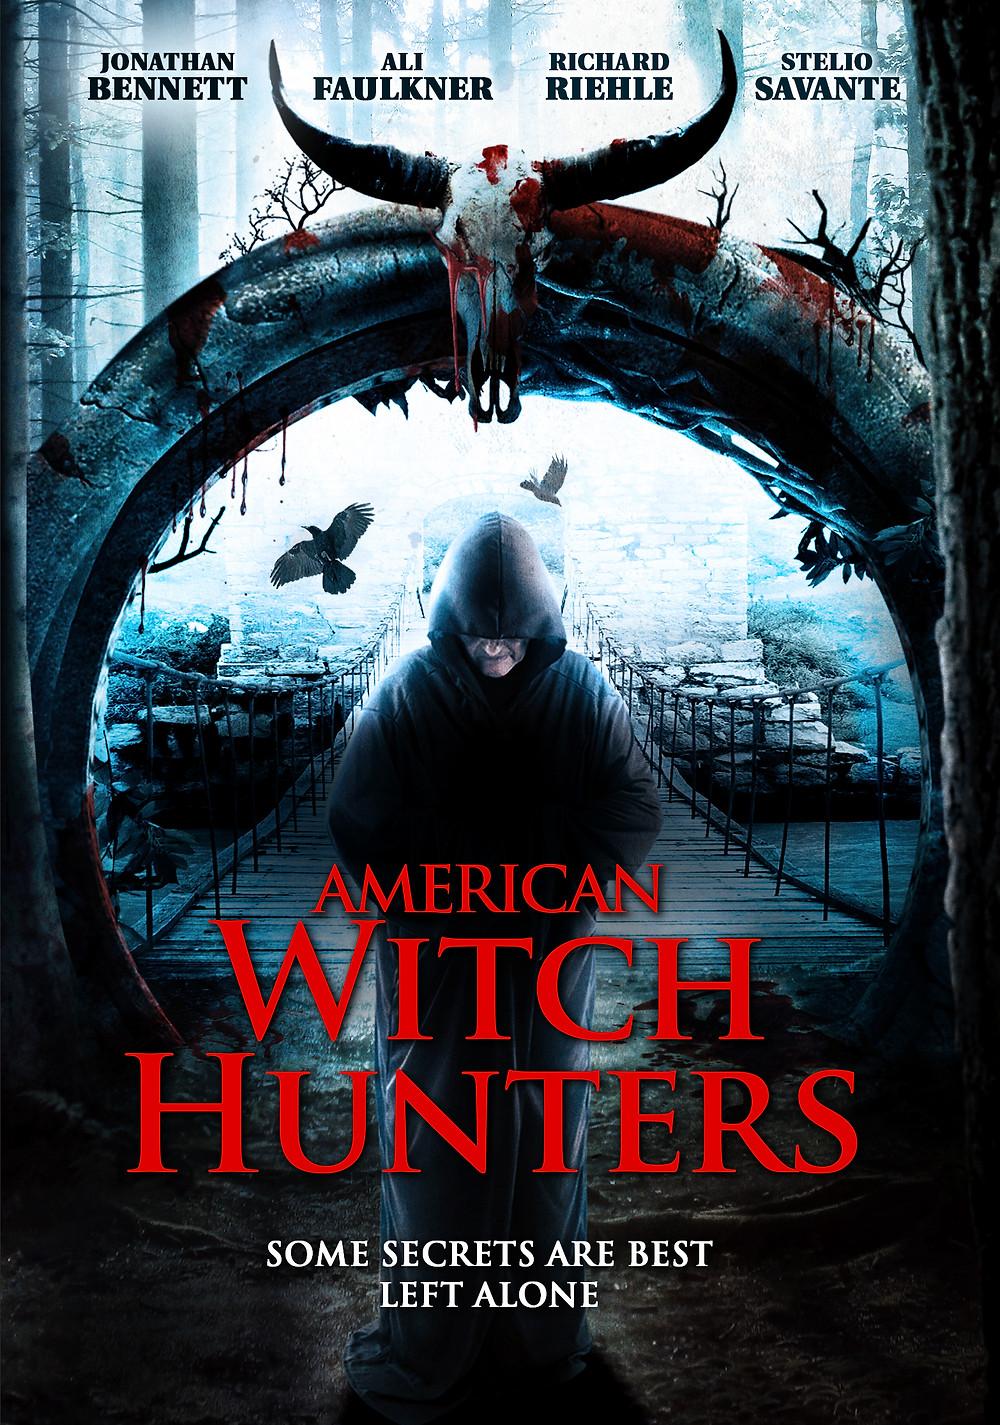 American-Witch-Hunters2.jpg